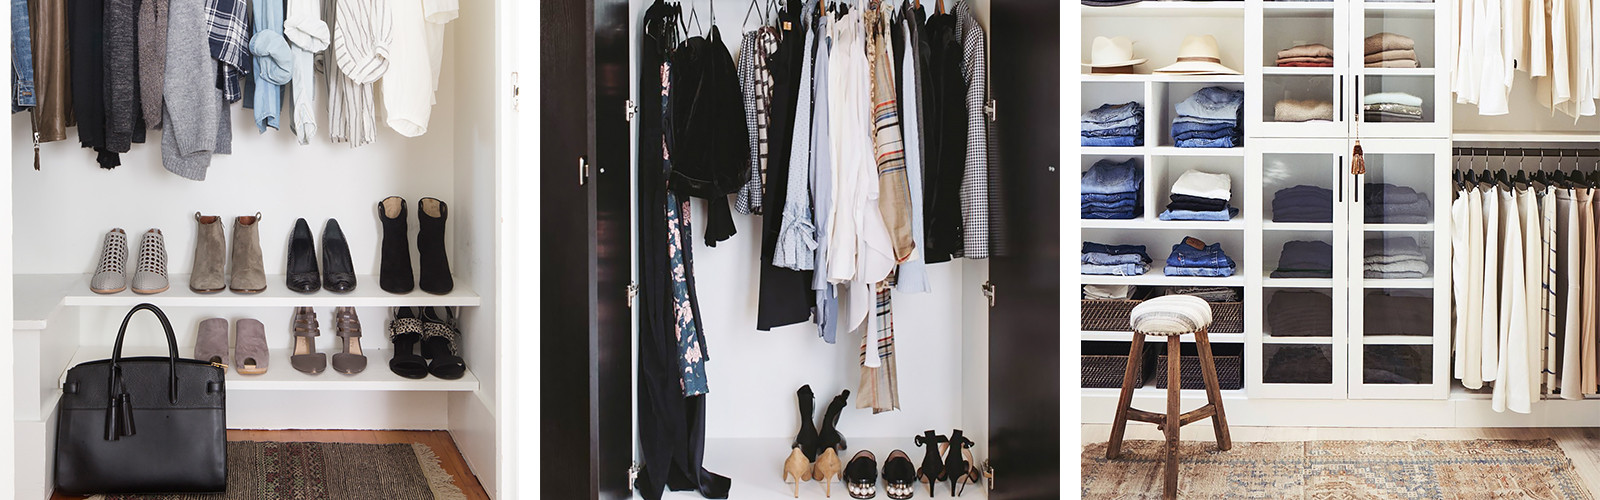 Exceptional A Professional Organizer Overhauled My Closetu2014Hereu0027s What Happened |  MyDomaine